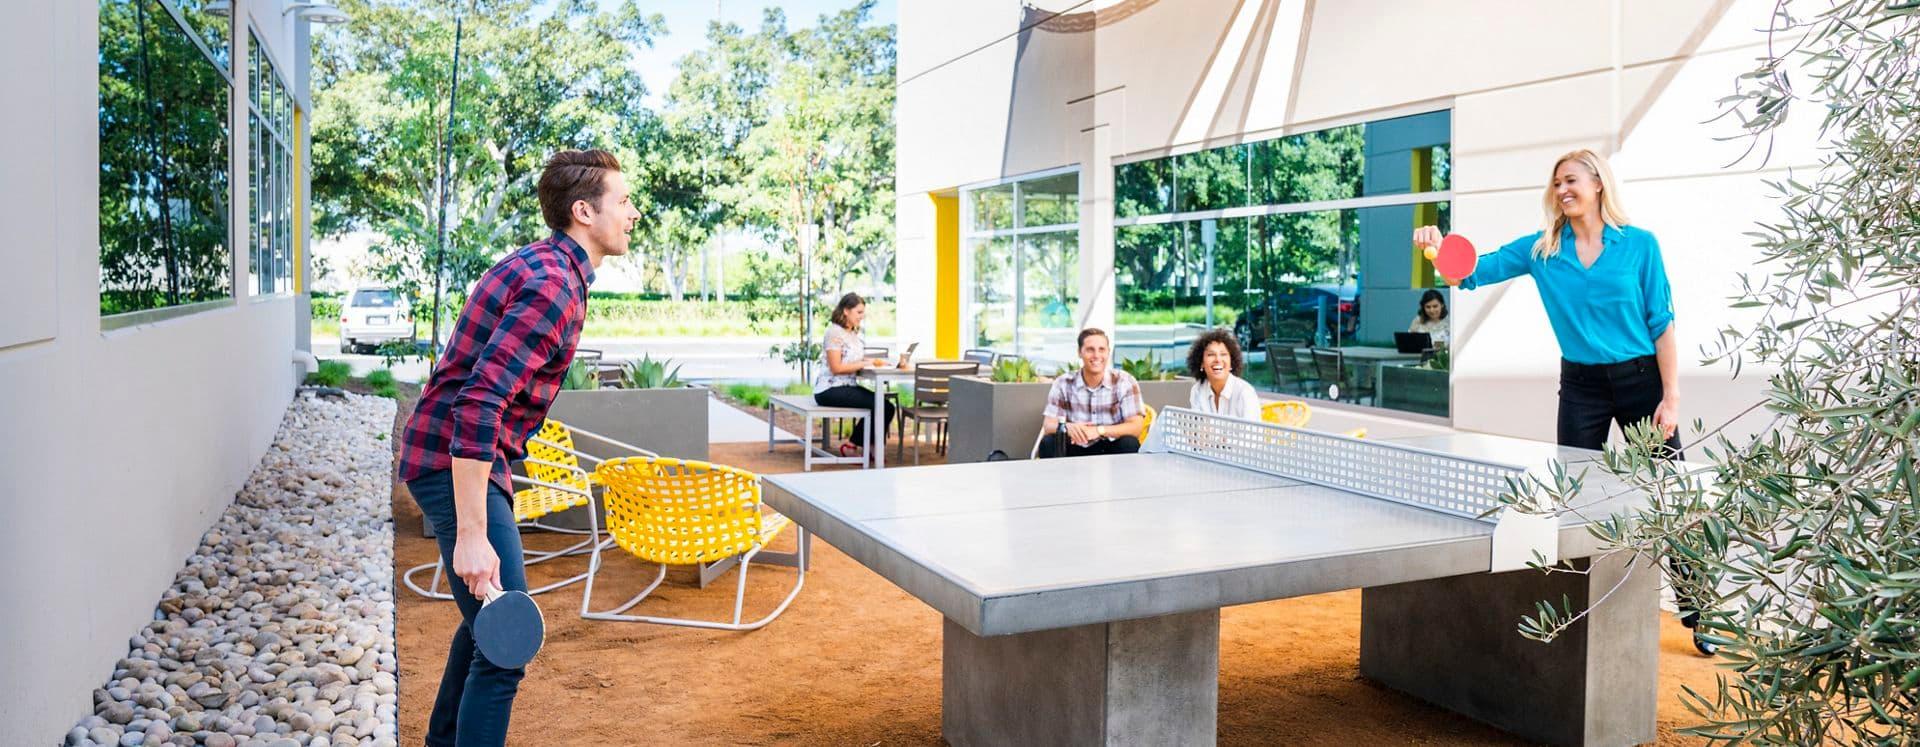 Lifestyle photography of Alton Plaza in Irvine, CA